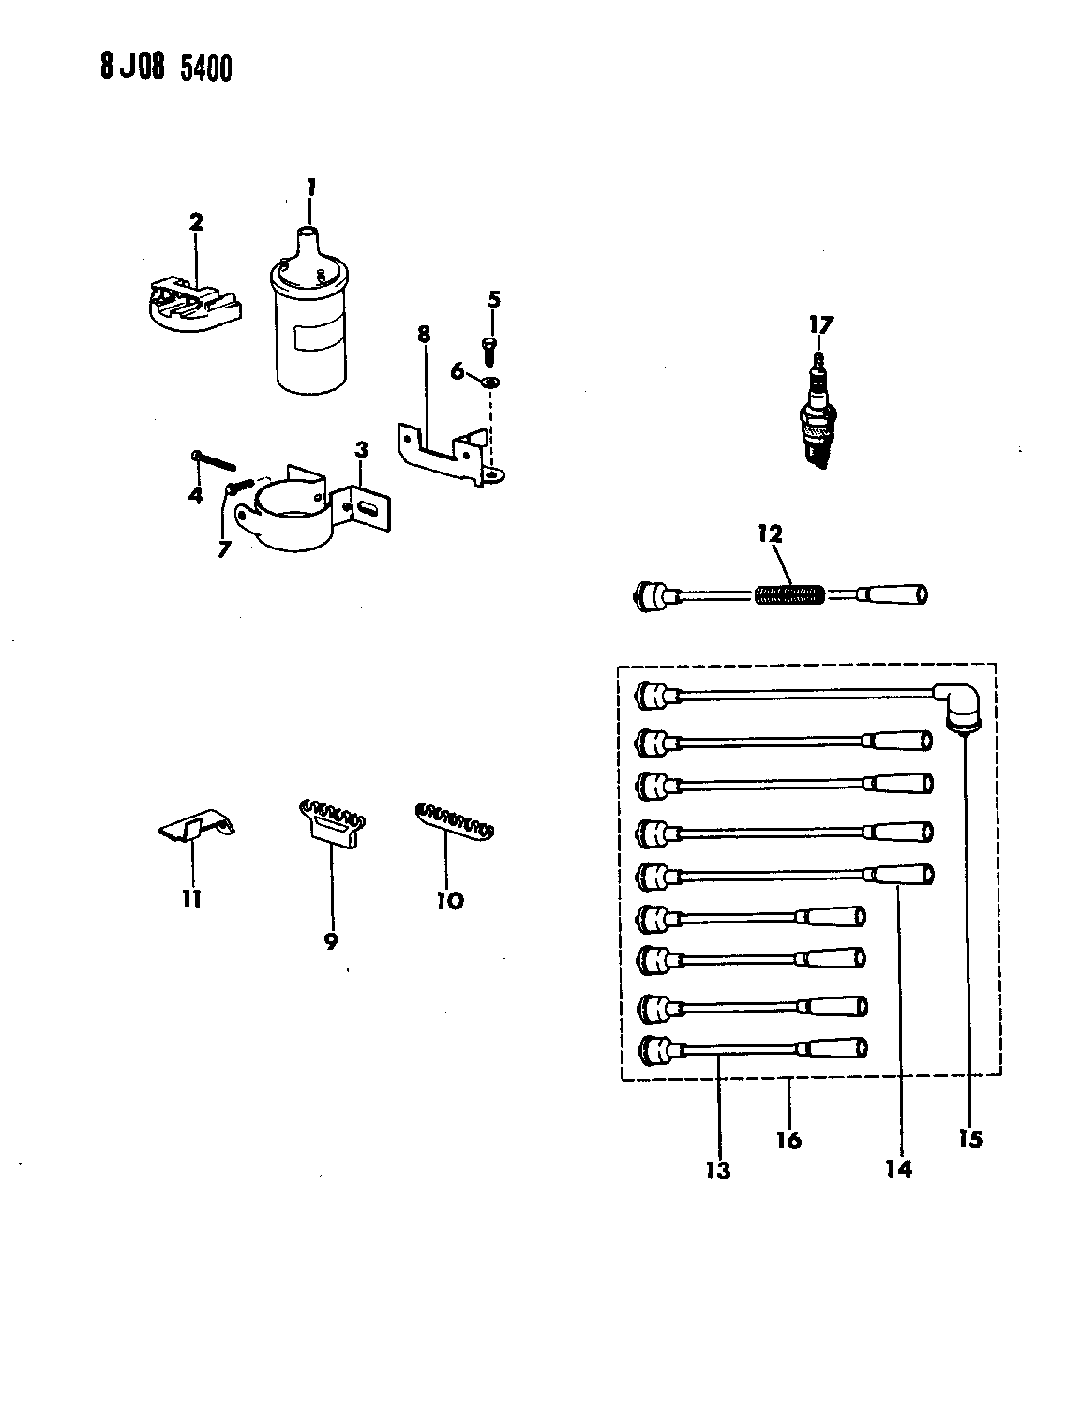 1988 jeep grand wagoneer coil sparkplugs wires rh moparpartsgiant com